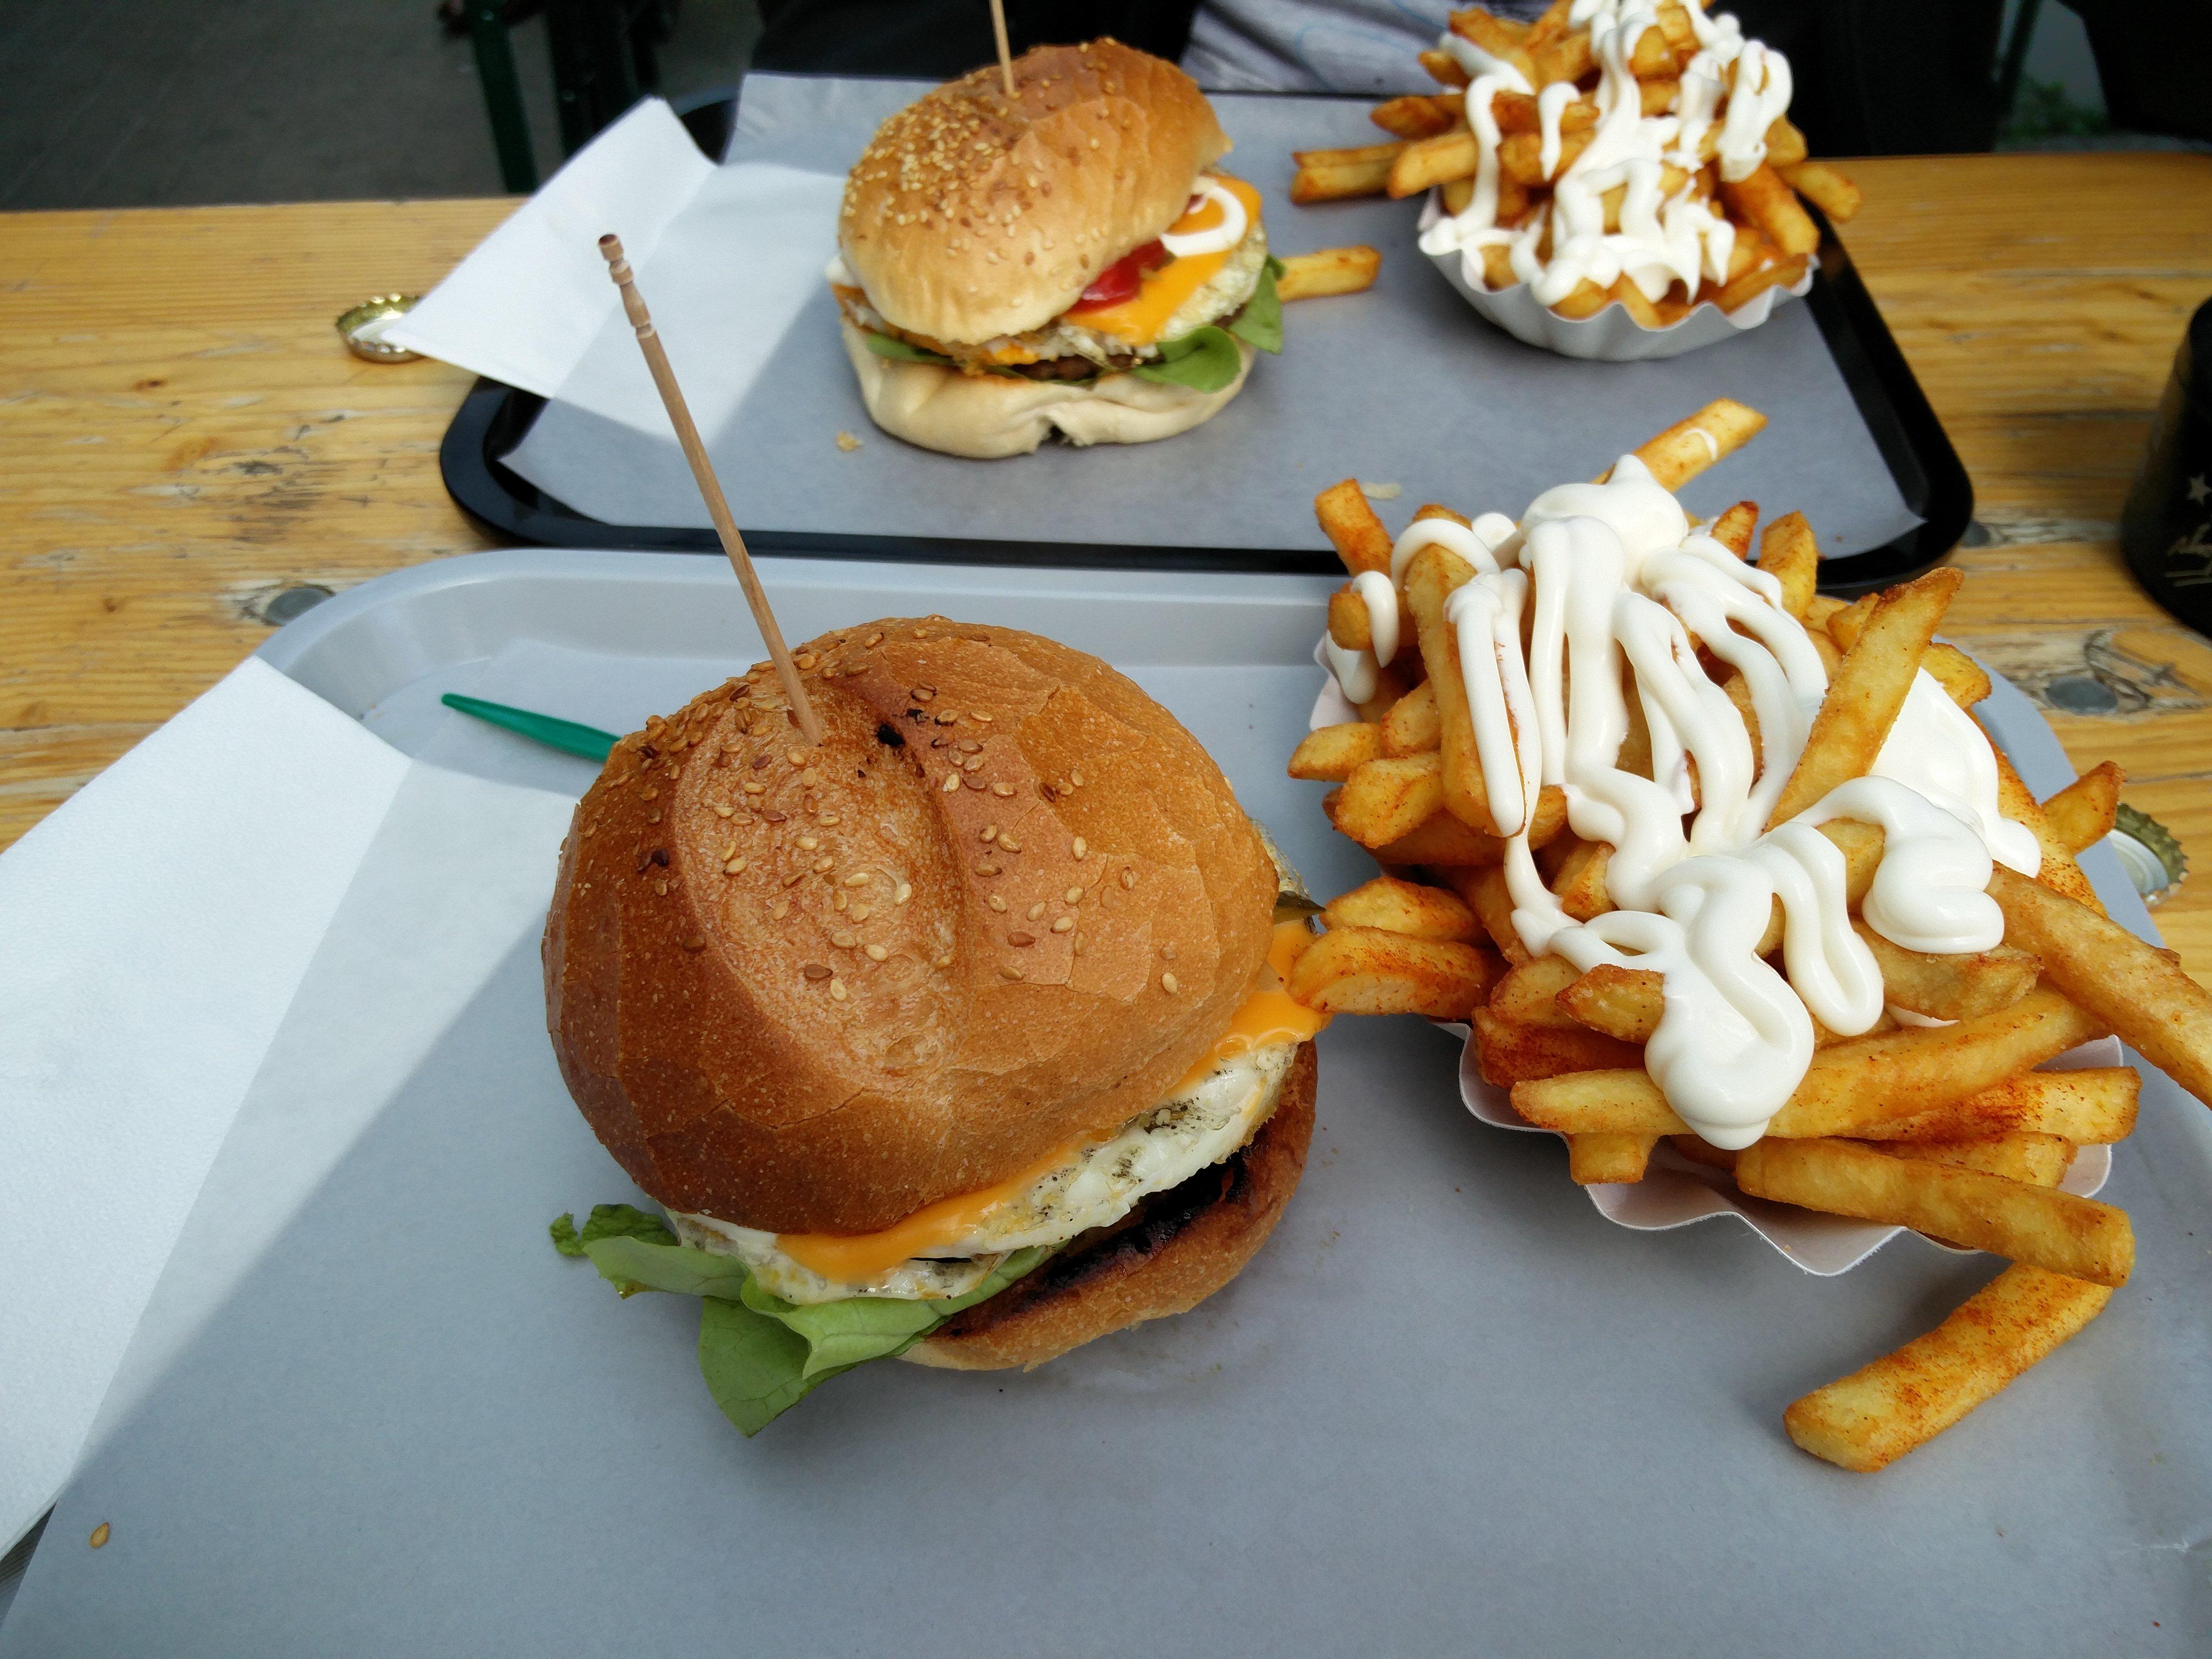 https://foodloader.net/nico_2016-05-02_chegg-burger-mit-pommes-frites.jpg